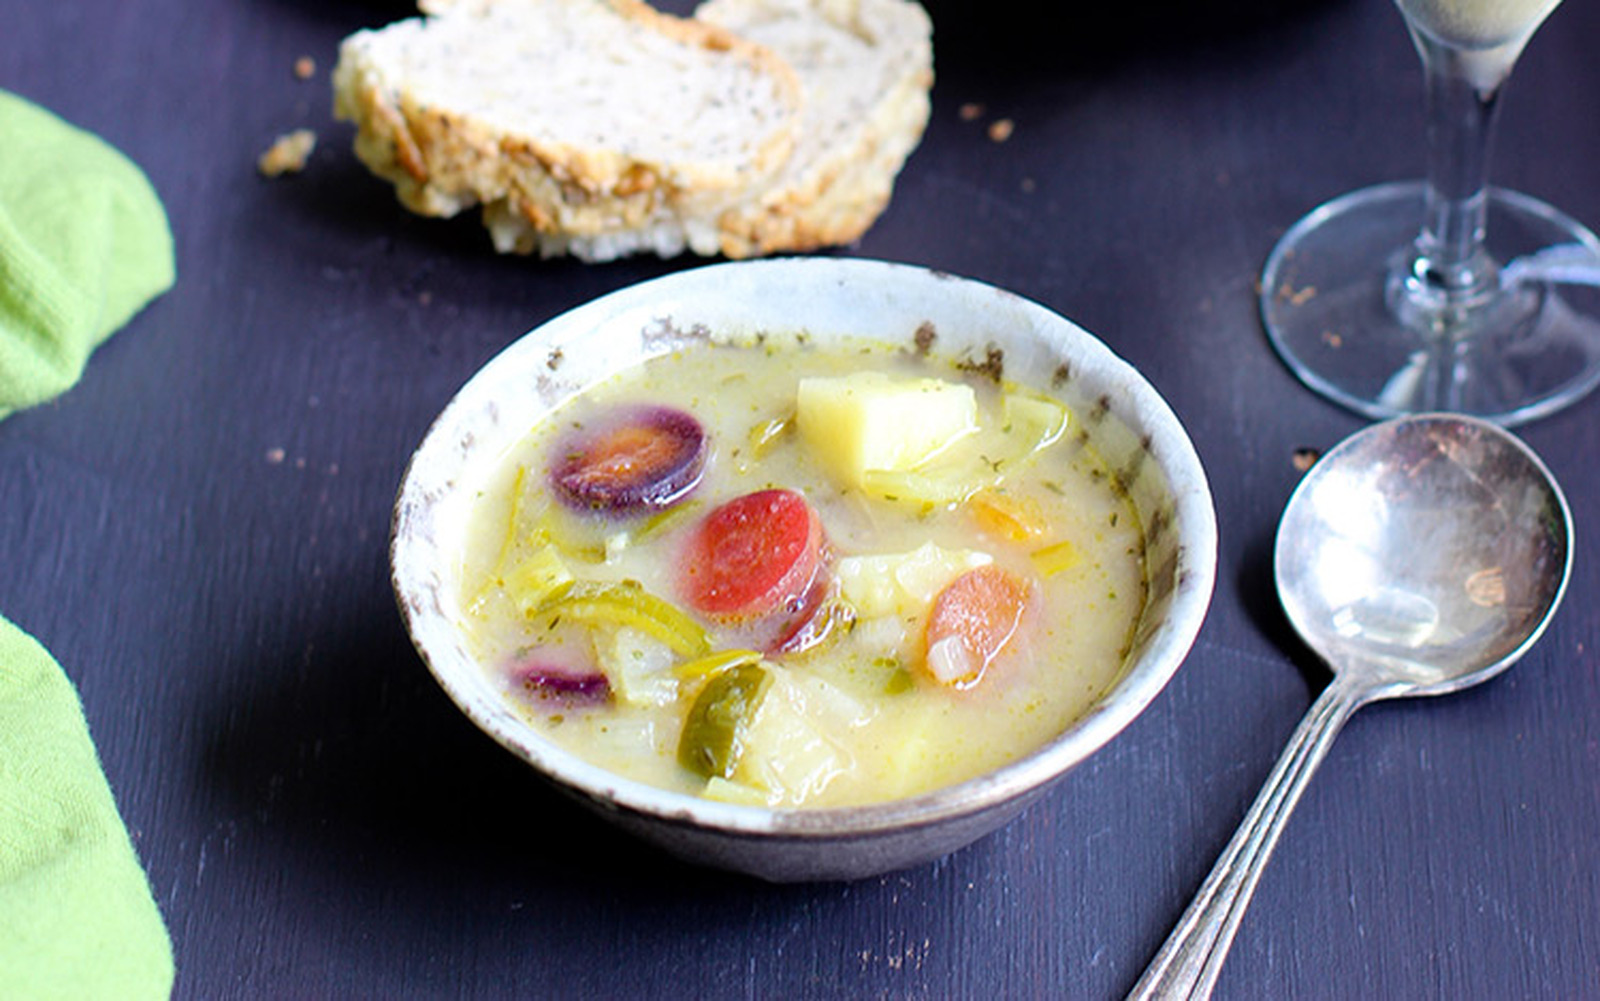 Potato Leek Soup With Caramelized Tri-Color Carrots [Vegan, Gluten-Free]